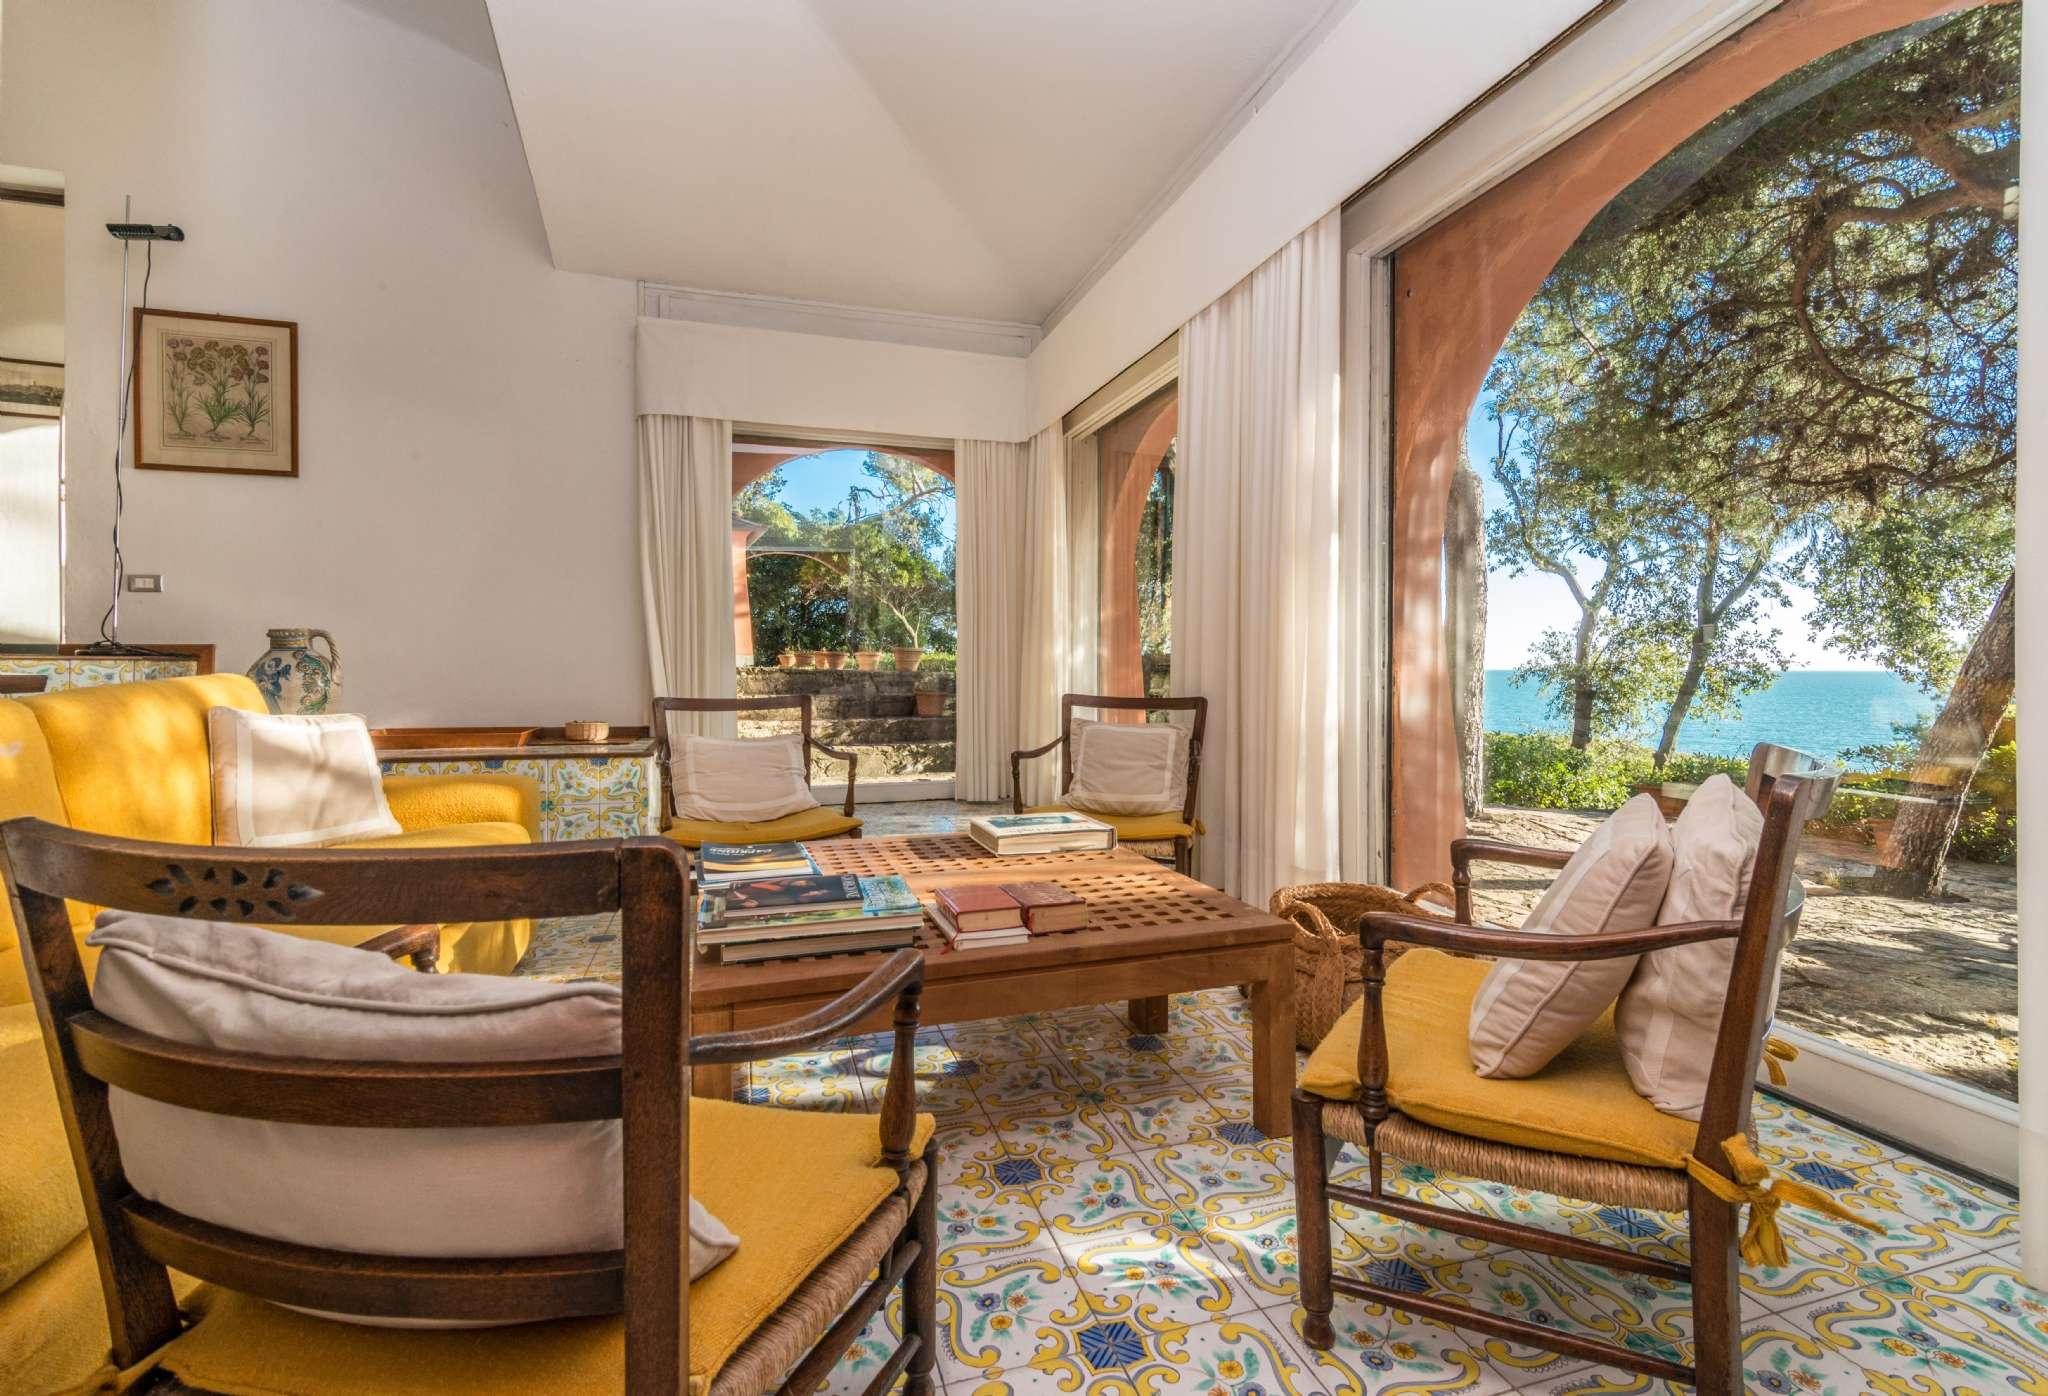 Villa in Vendita a Lerici: 5 locali, 340 mq - Foto 9